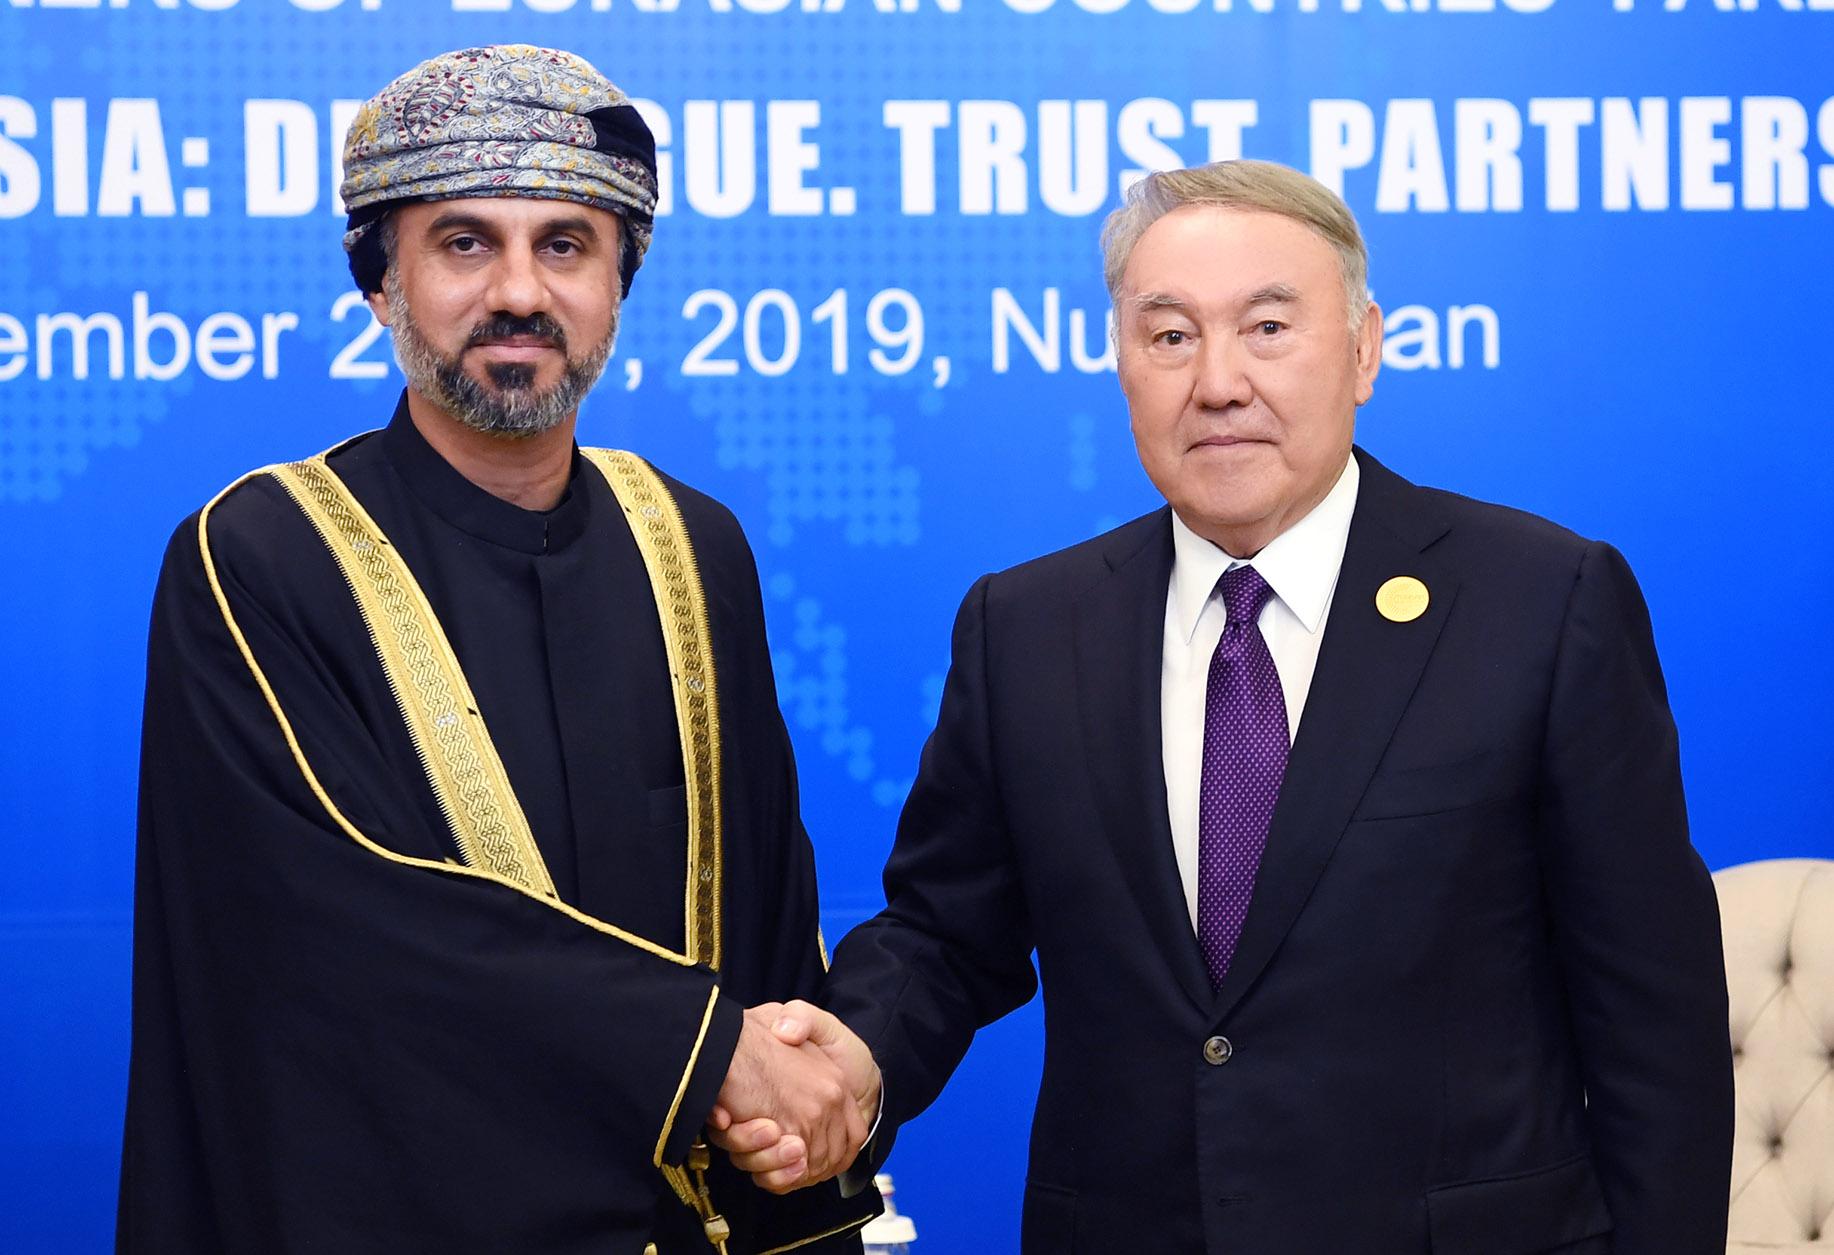 Нурсултан Назарбаев провел ряд встреч с парламентариями стран Евразии 2